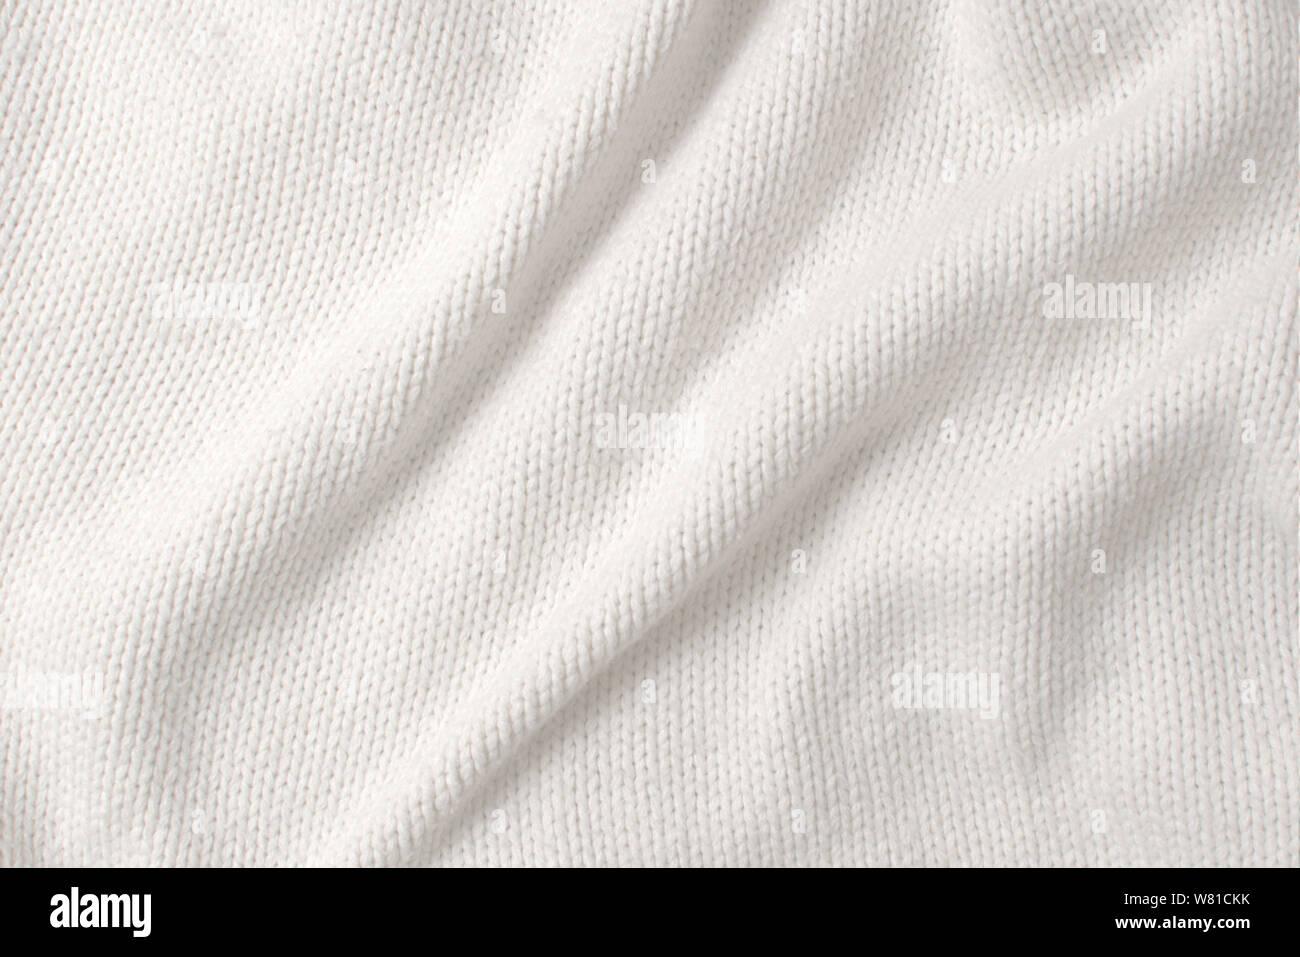 free shipping 7bb3a e0b86 Weißer Wollpullover, Textur Detail Nahaufnahme Stockfoto ...